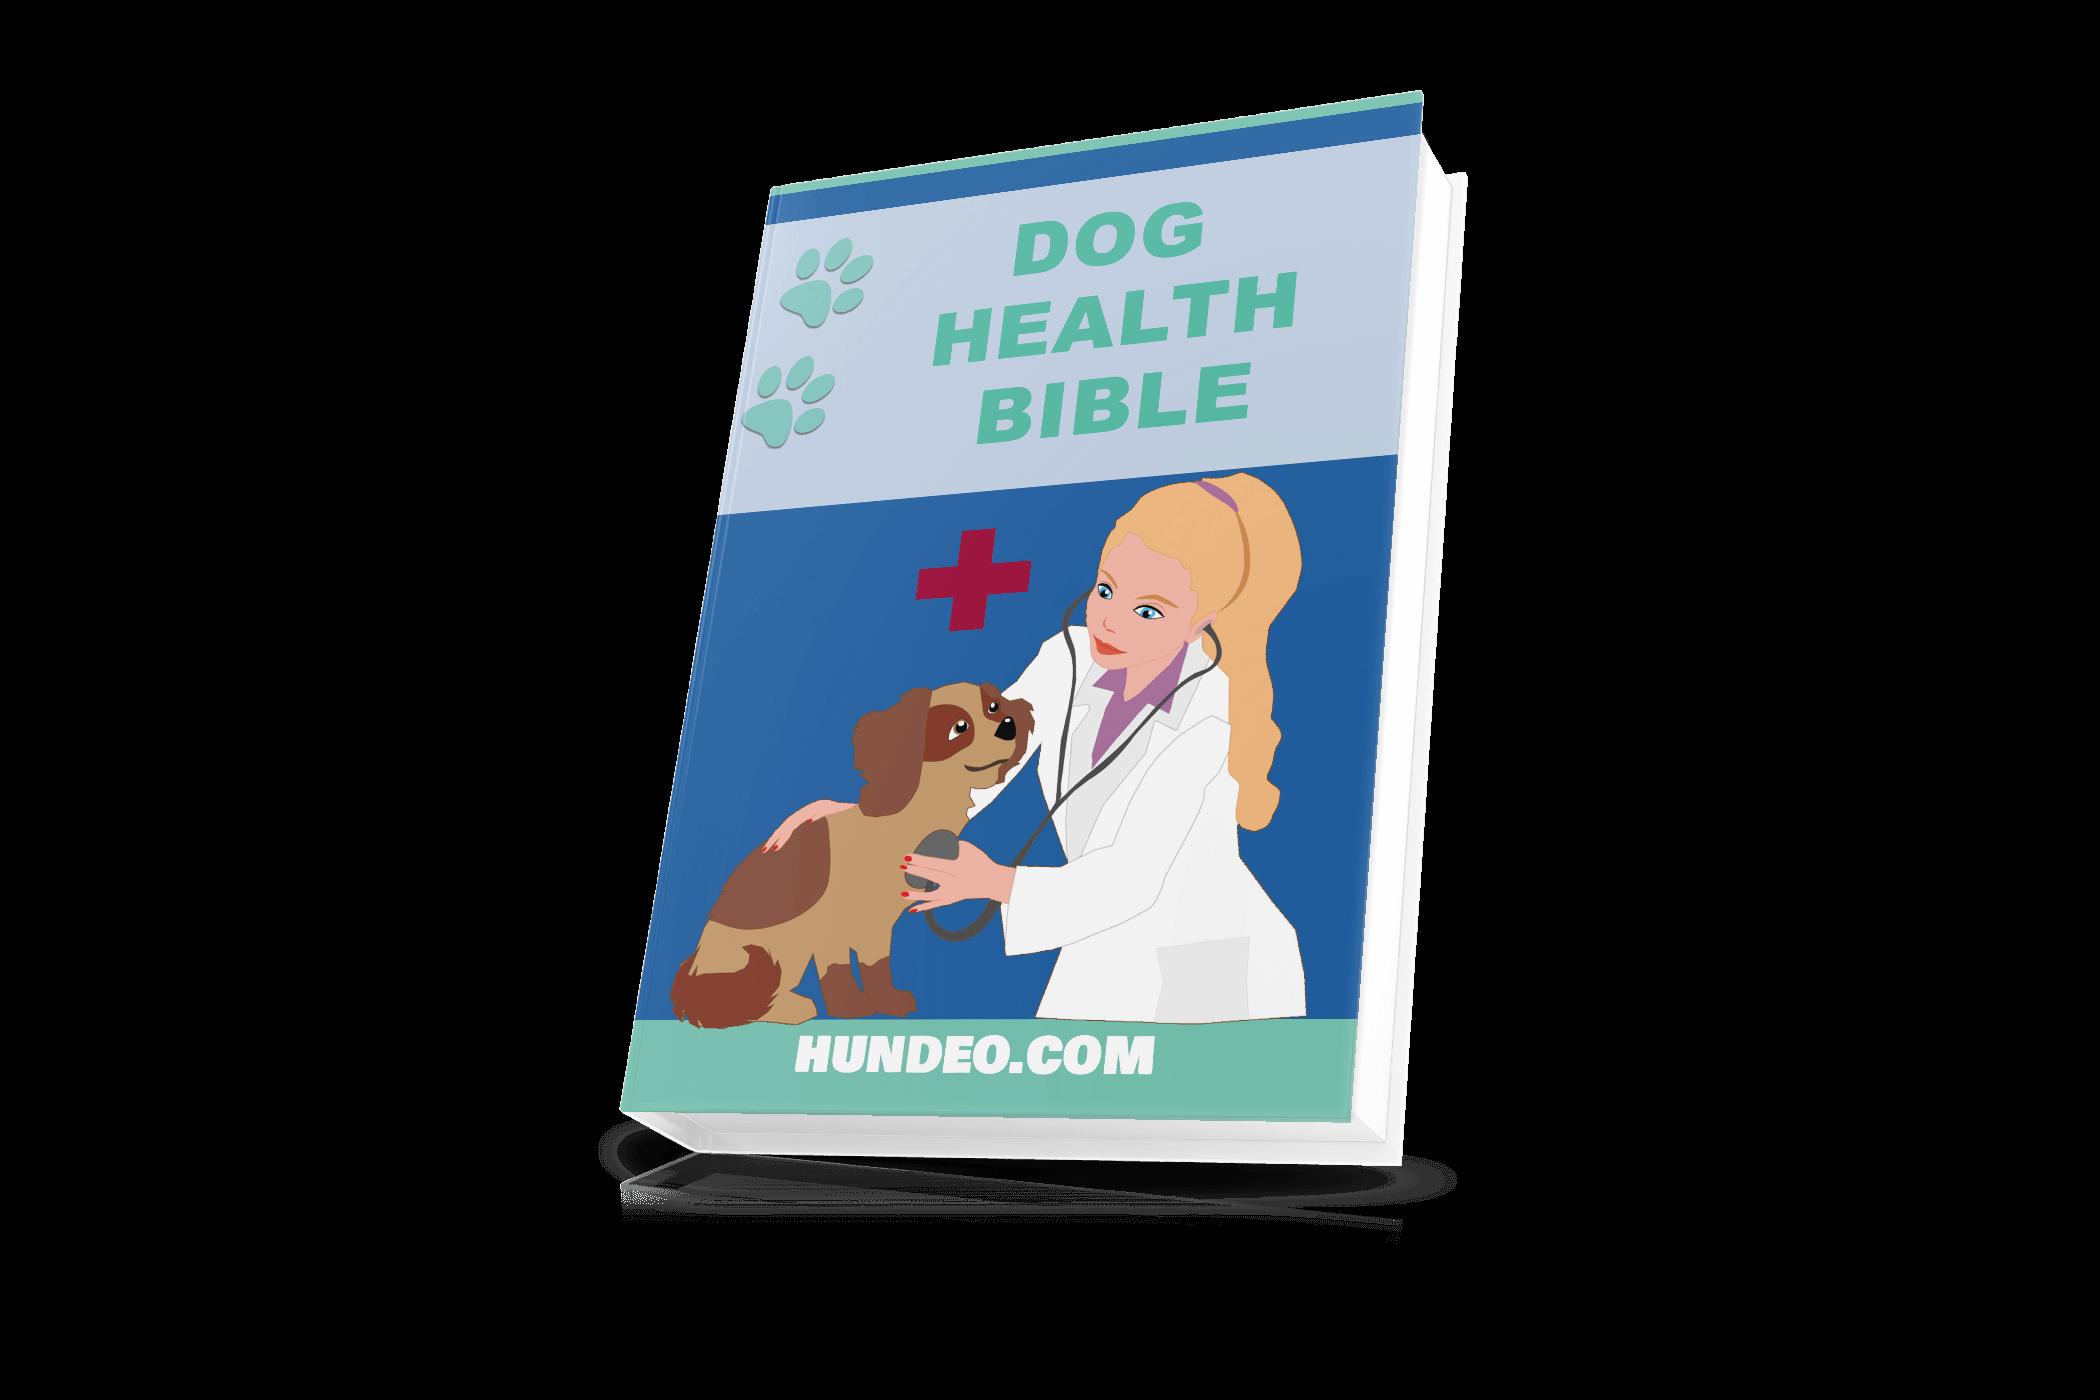 doghealthbible_book